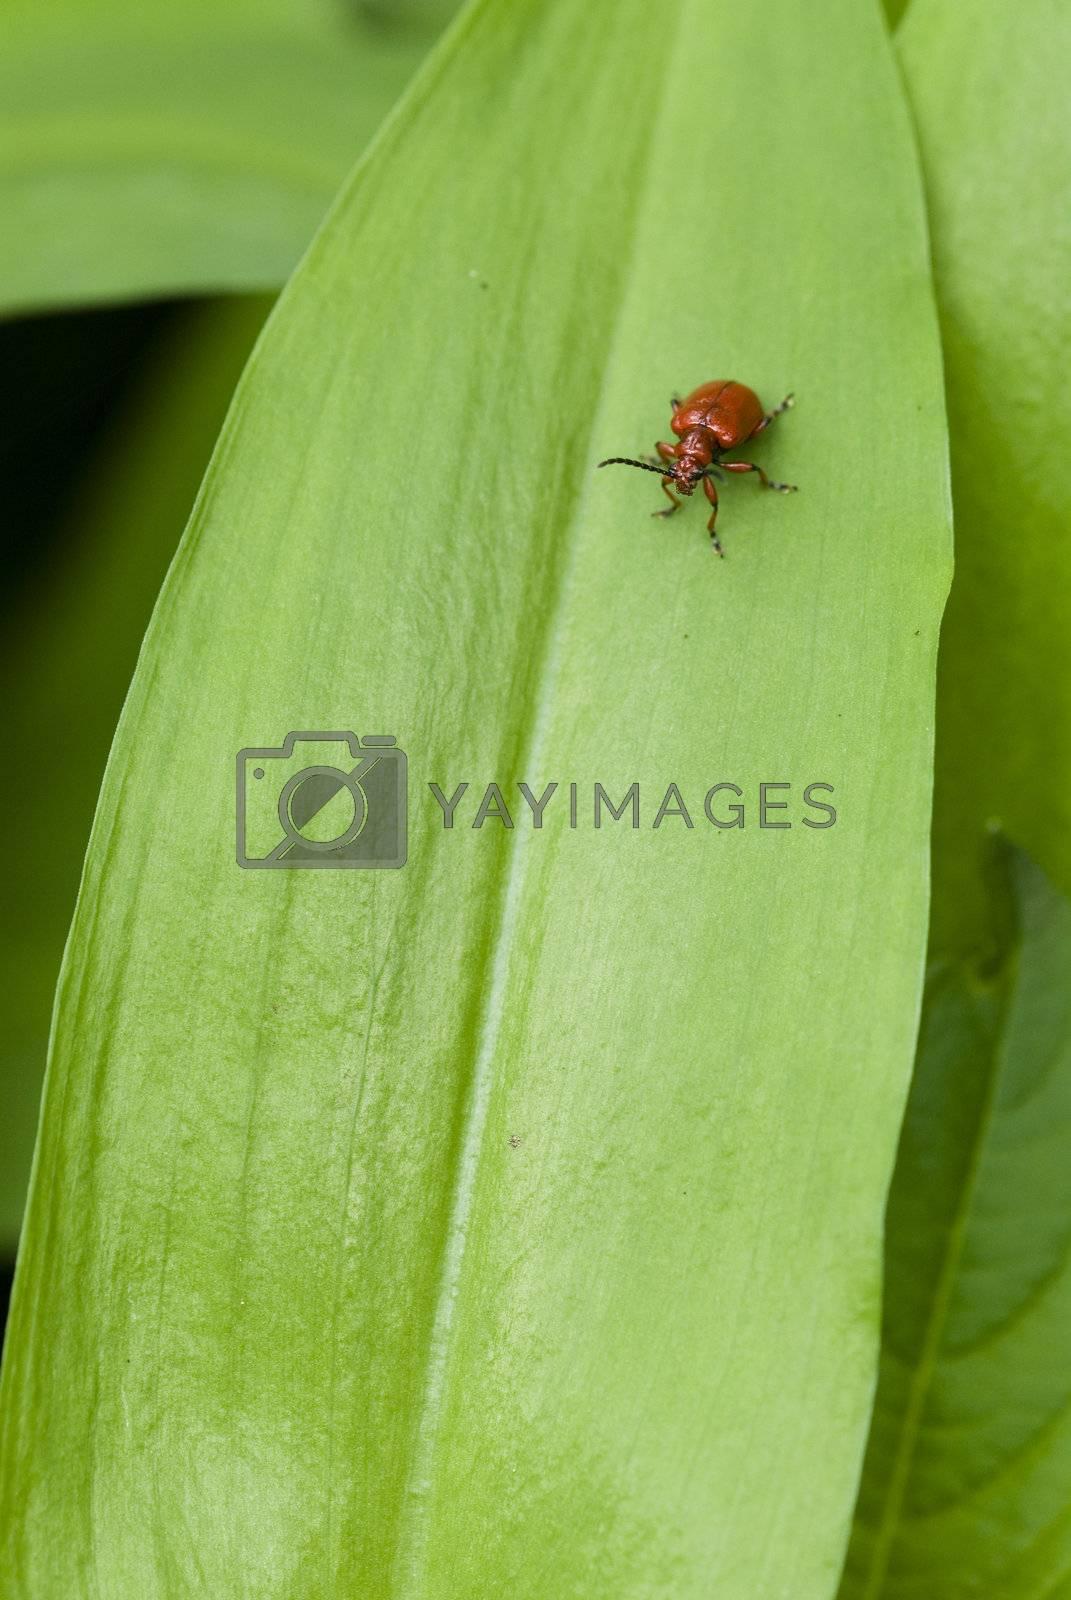 Royalty free image of Red coleopteron on Allium leaf,Lilioceris, merdigera, by AlessandroZocc